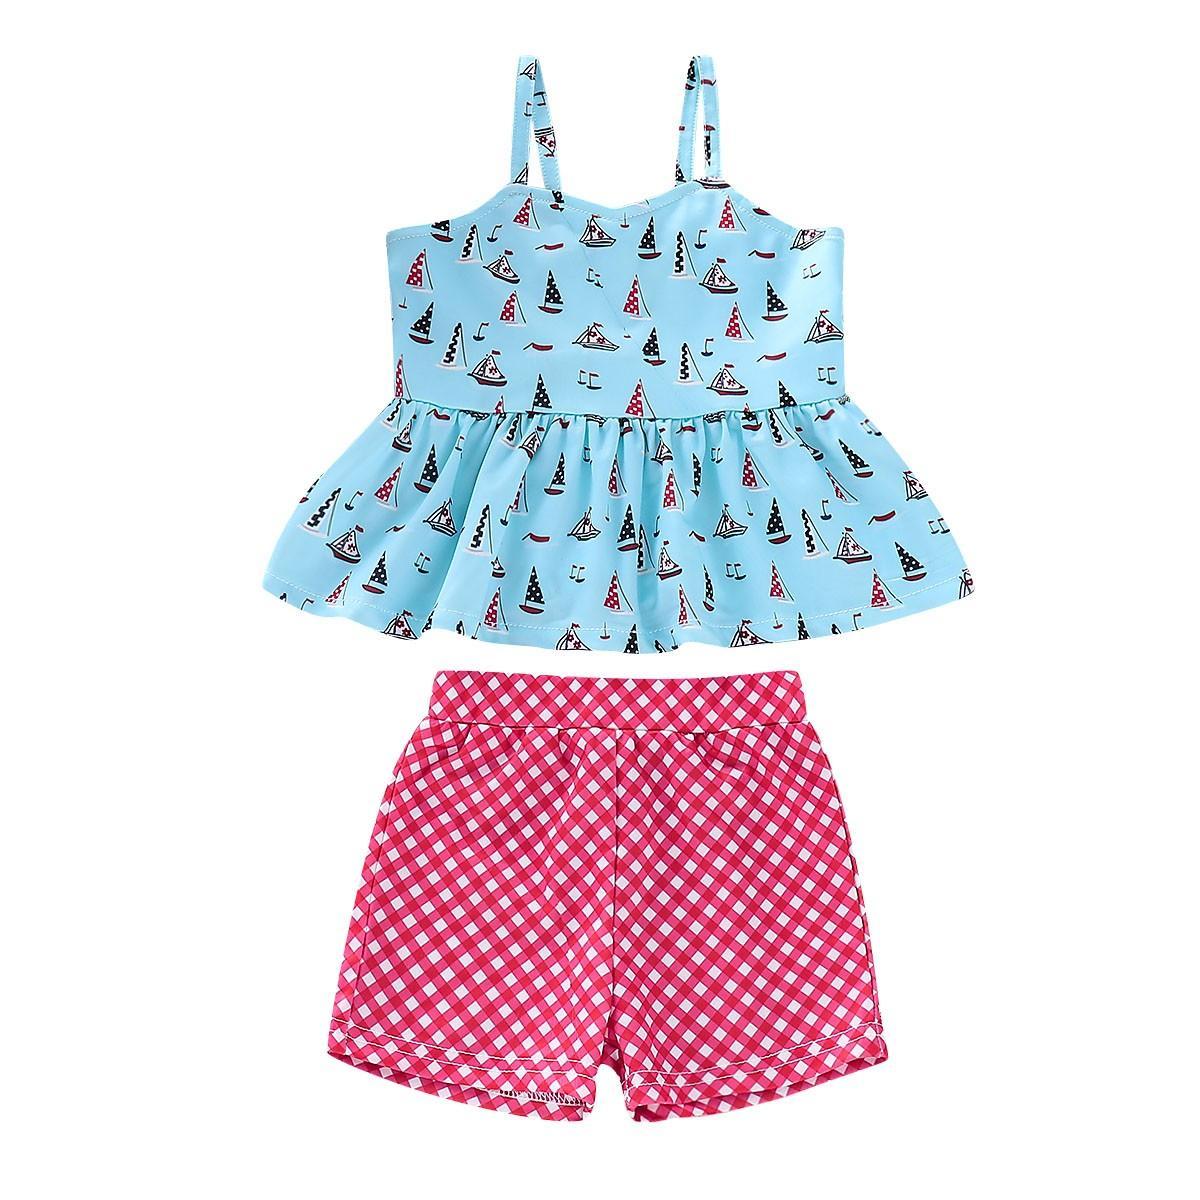 cdd12c3e24c BlingBlingStar Toddler Kids Girl Cartoon Two-piece Swimwear Swimsuit  Bathing Suit Clothes Set